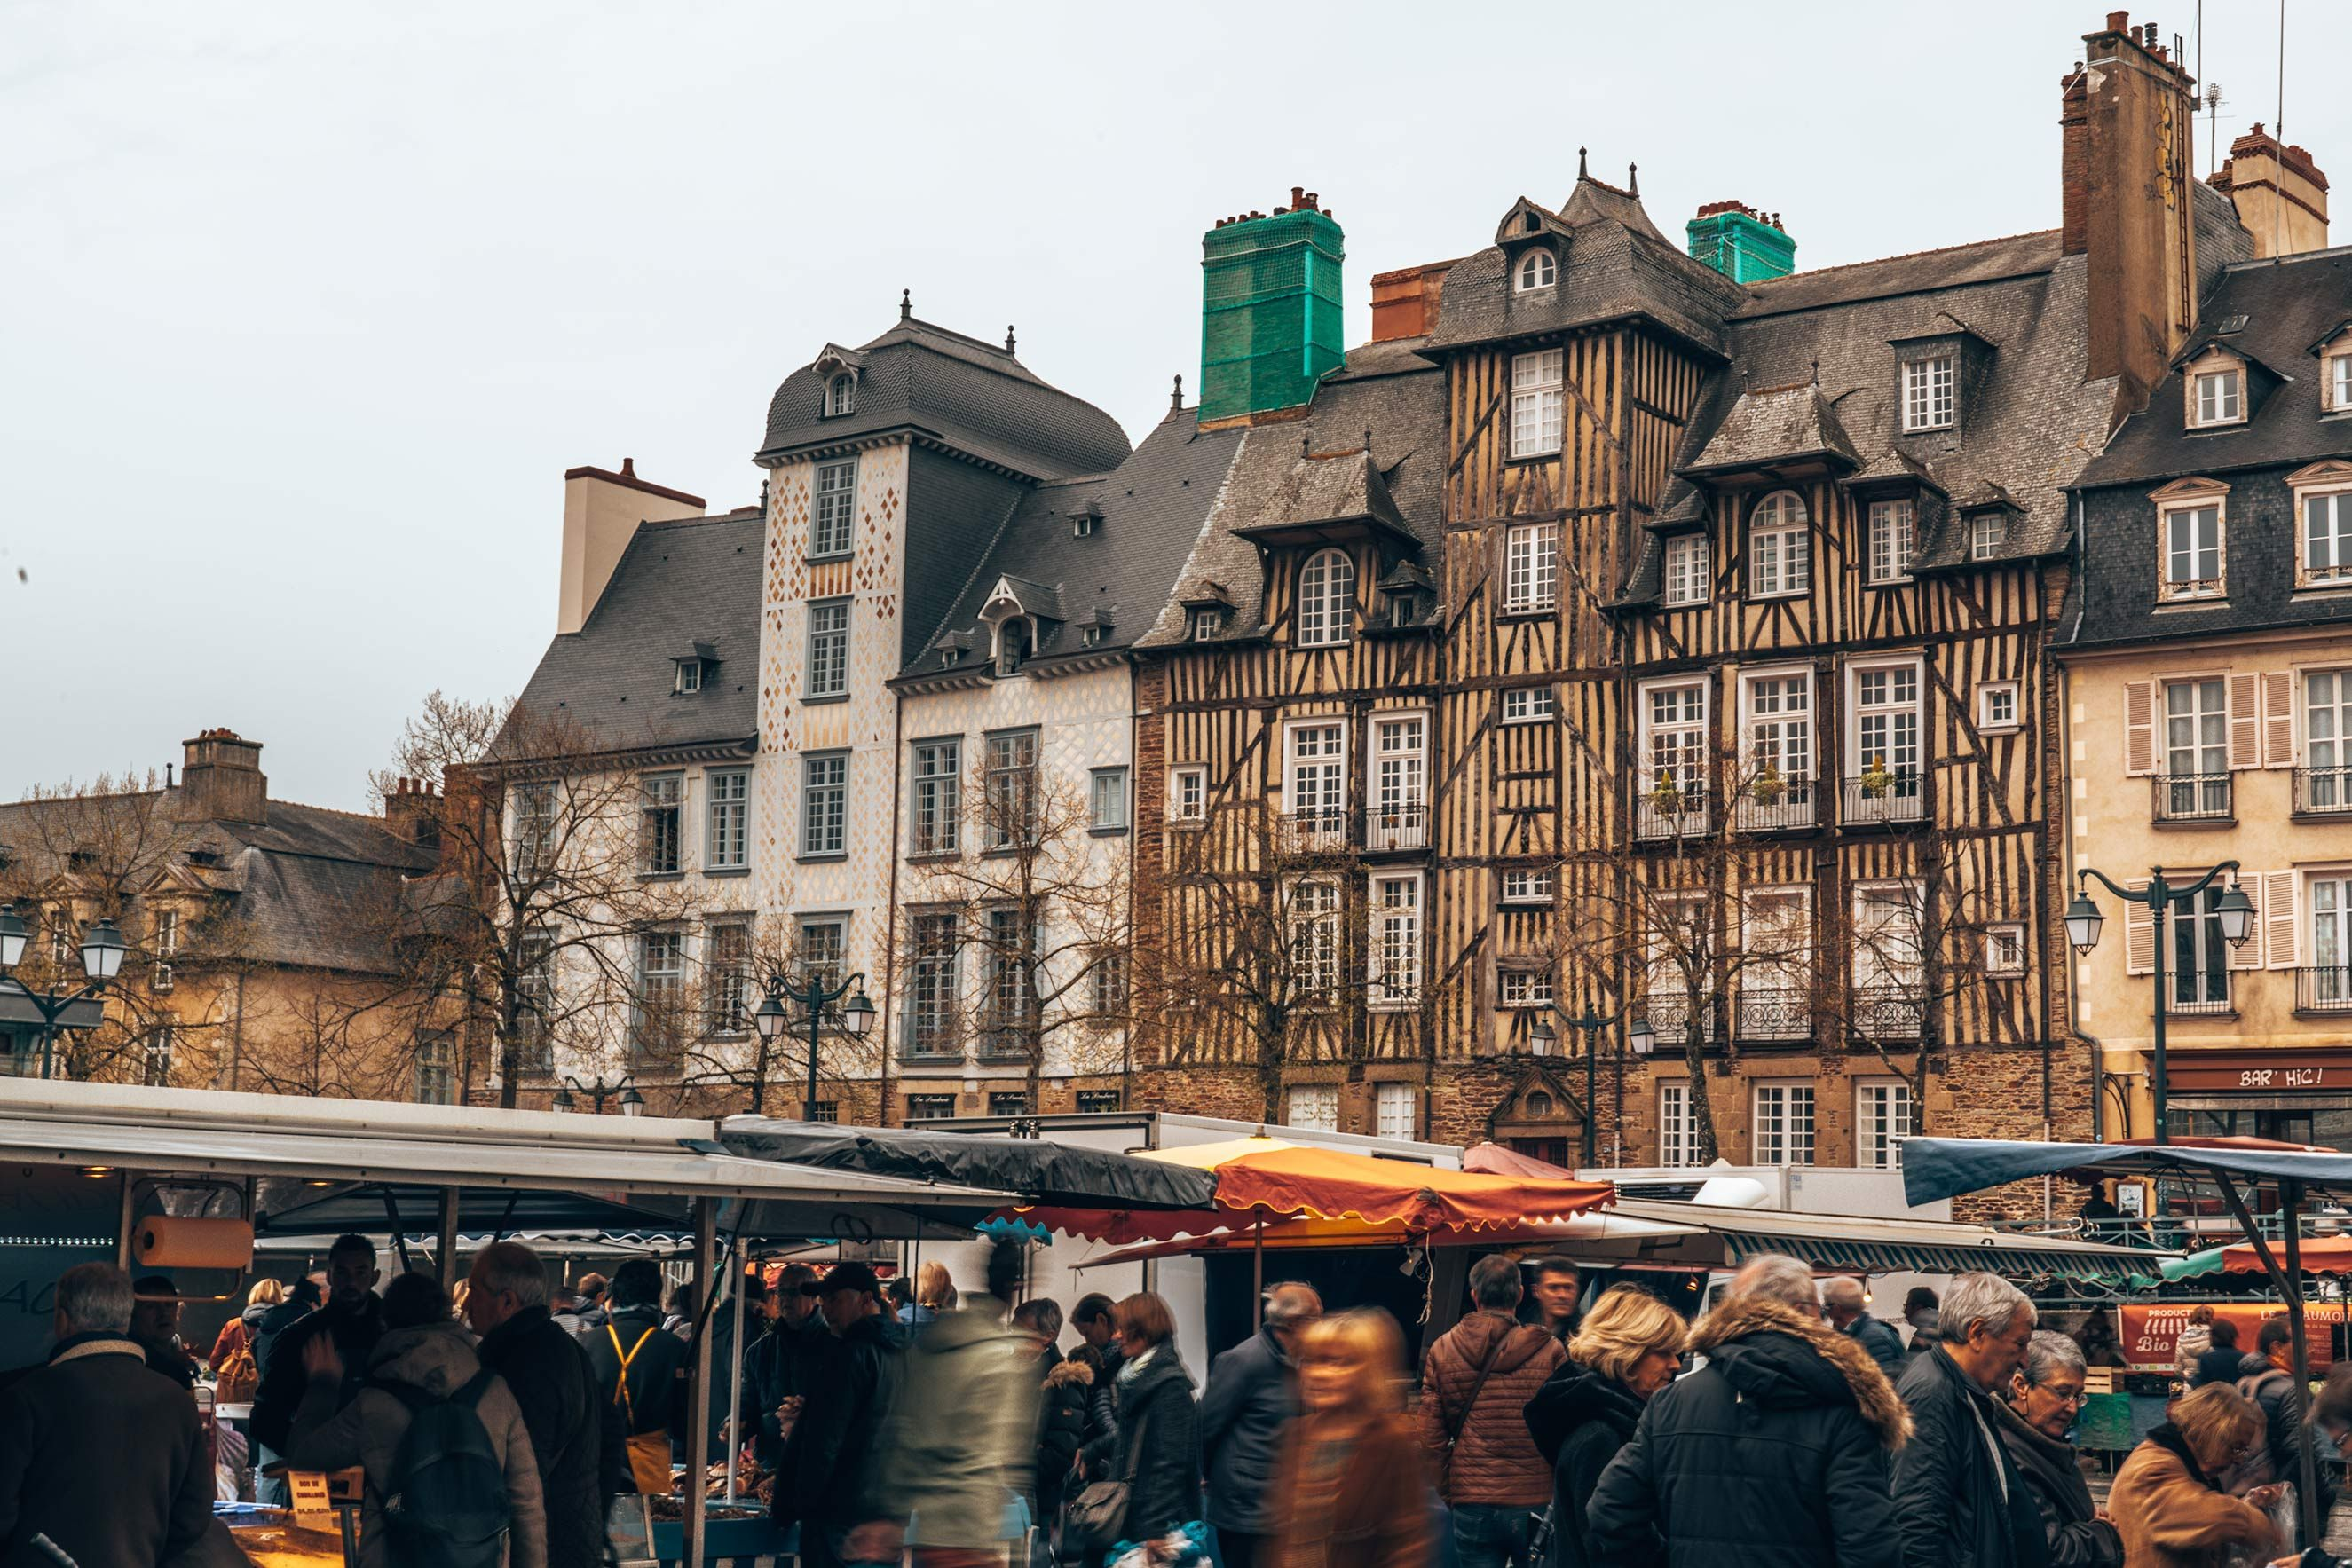 Visiter Rennes Visiter rennes, Rennes, Rennes bretagne